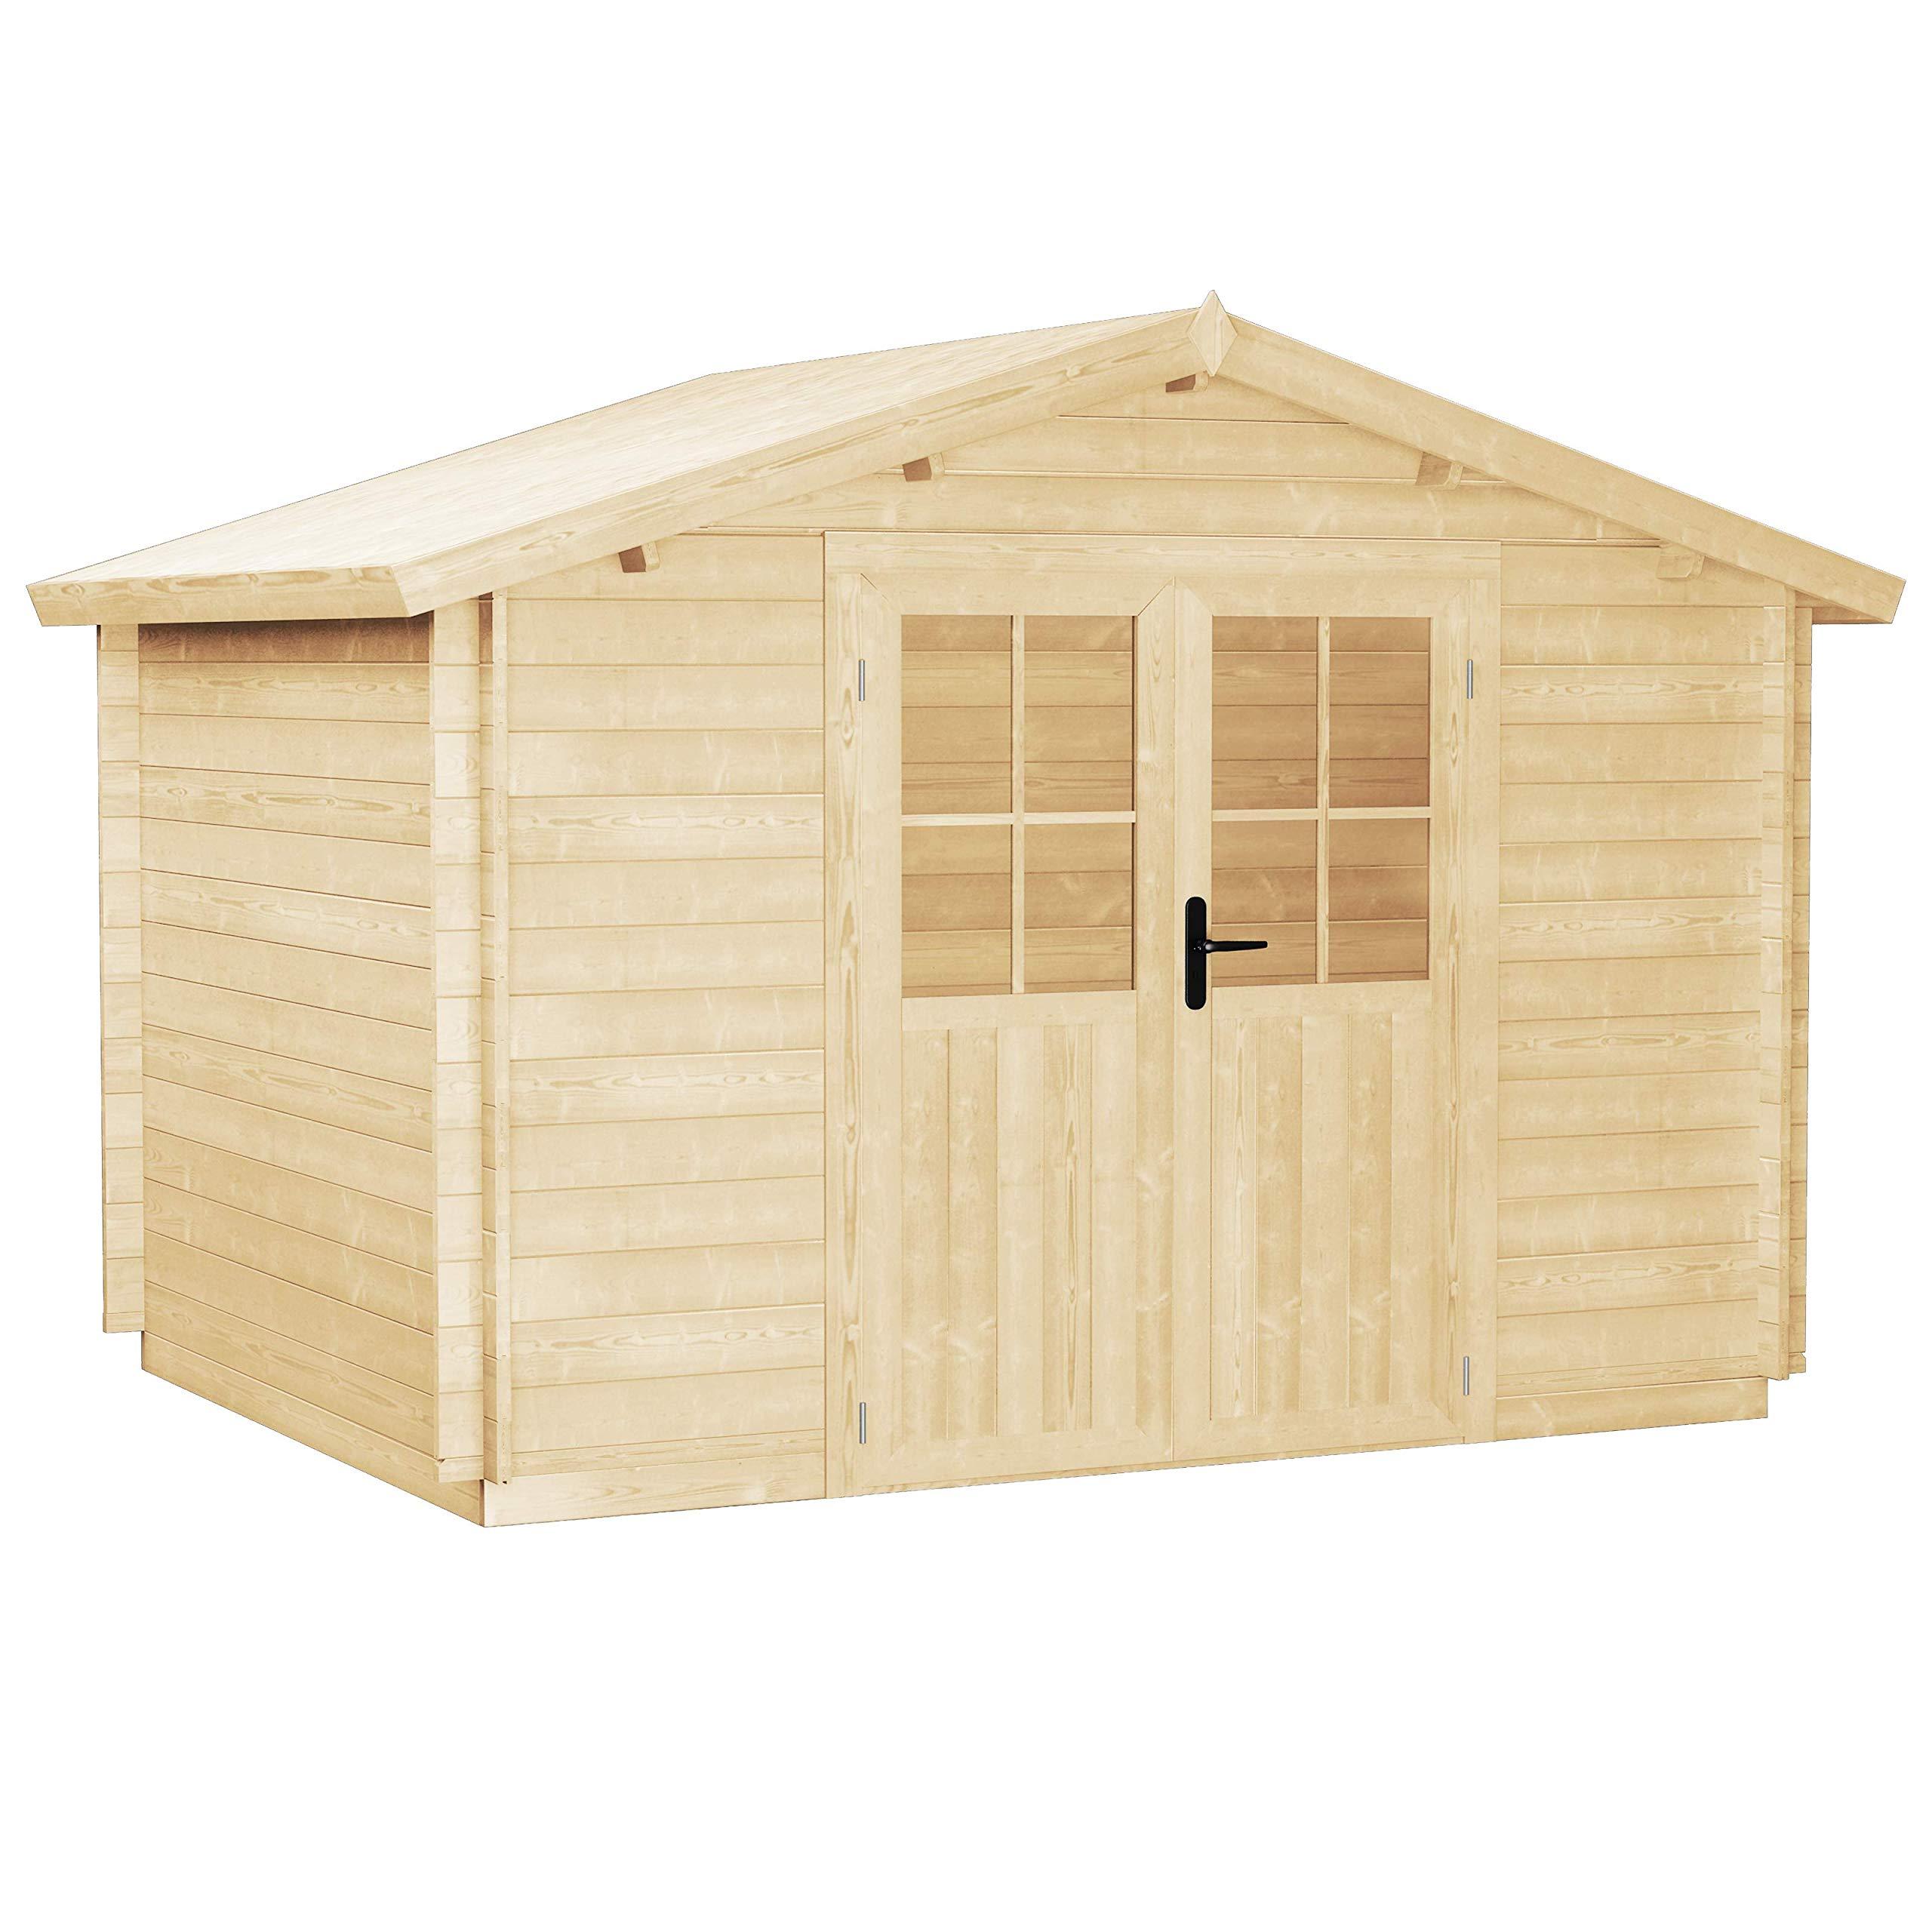 vidaXL - Caseta de jardín de madera maciza, 28 mm, 3, 1 x 3 m: Amazon.es: Jardín